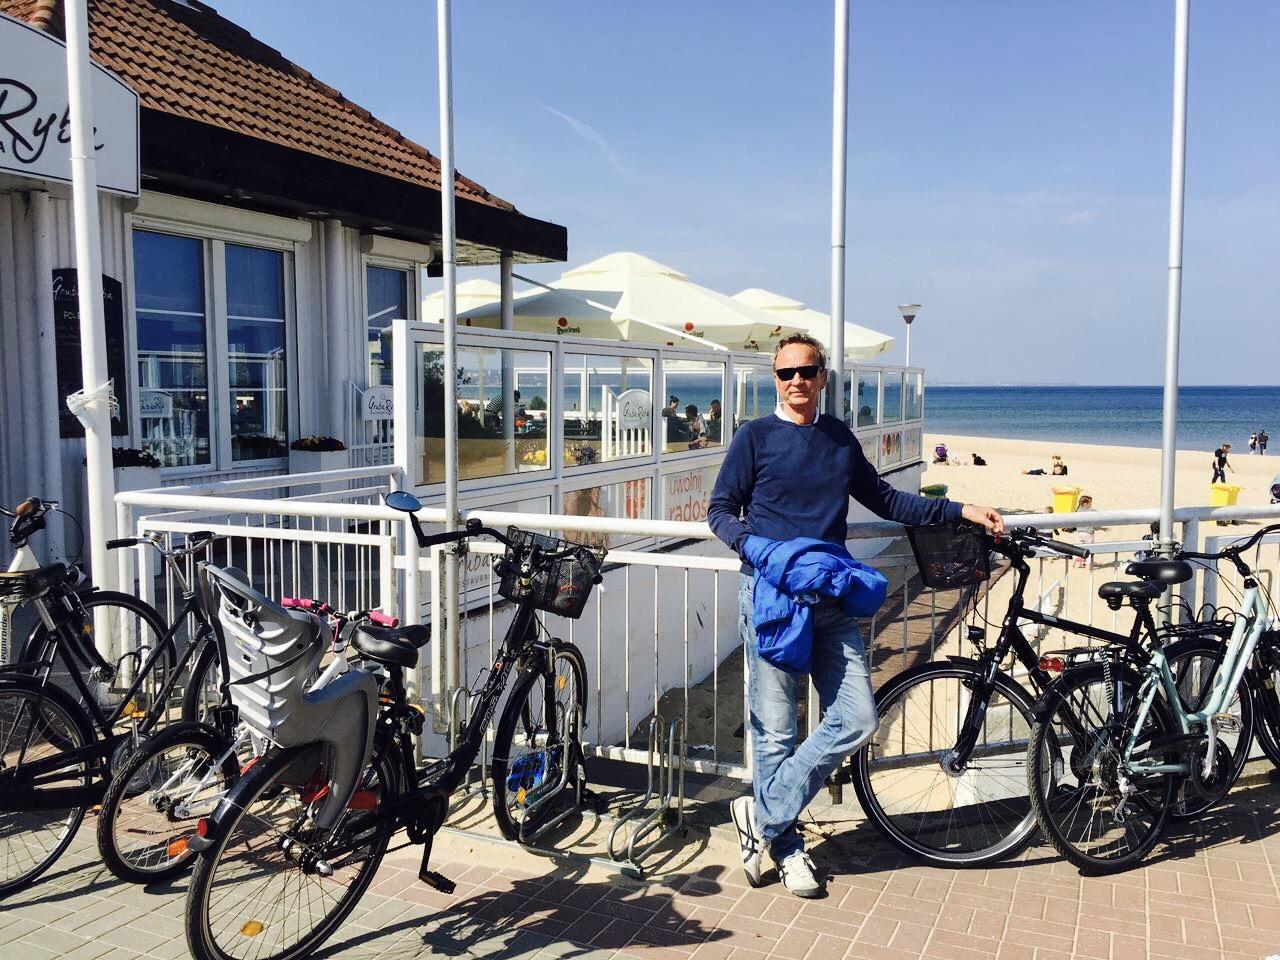 Mann an Strandbar mit Fahrrädern, Sopot, Polen